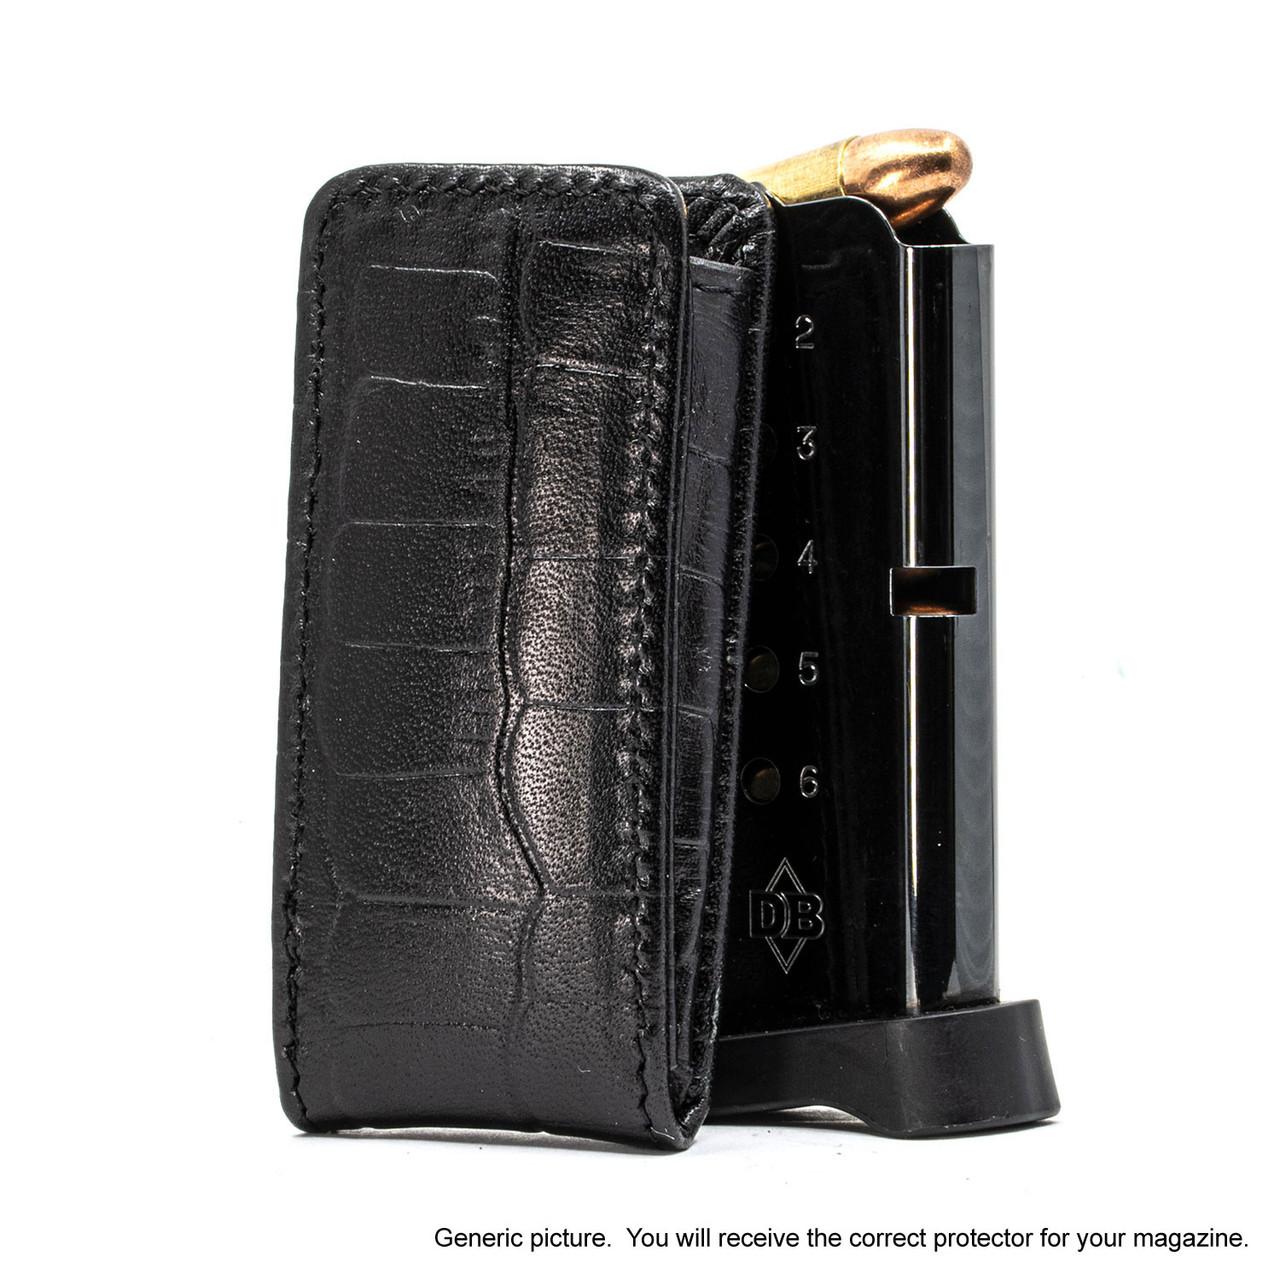 Rohrbaugh .380 Black Alligator Magazine Pocket Protector